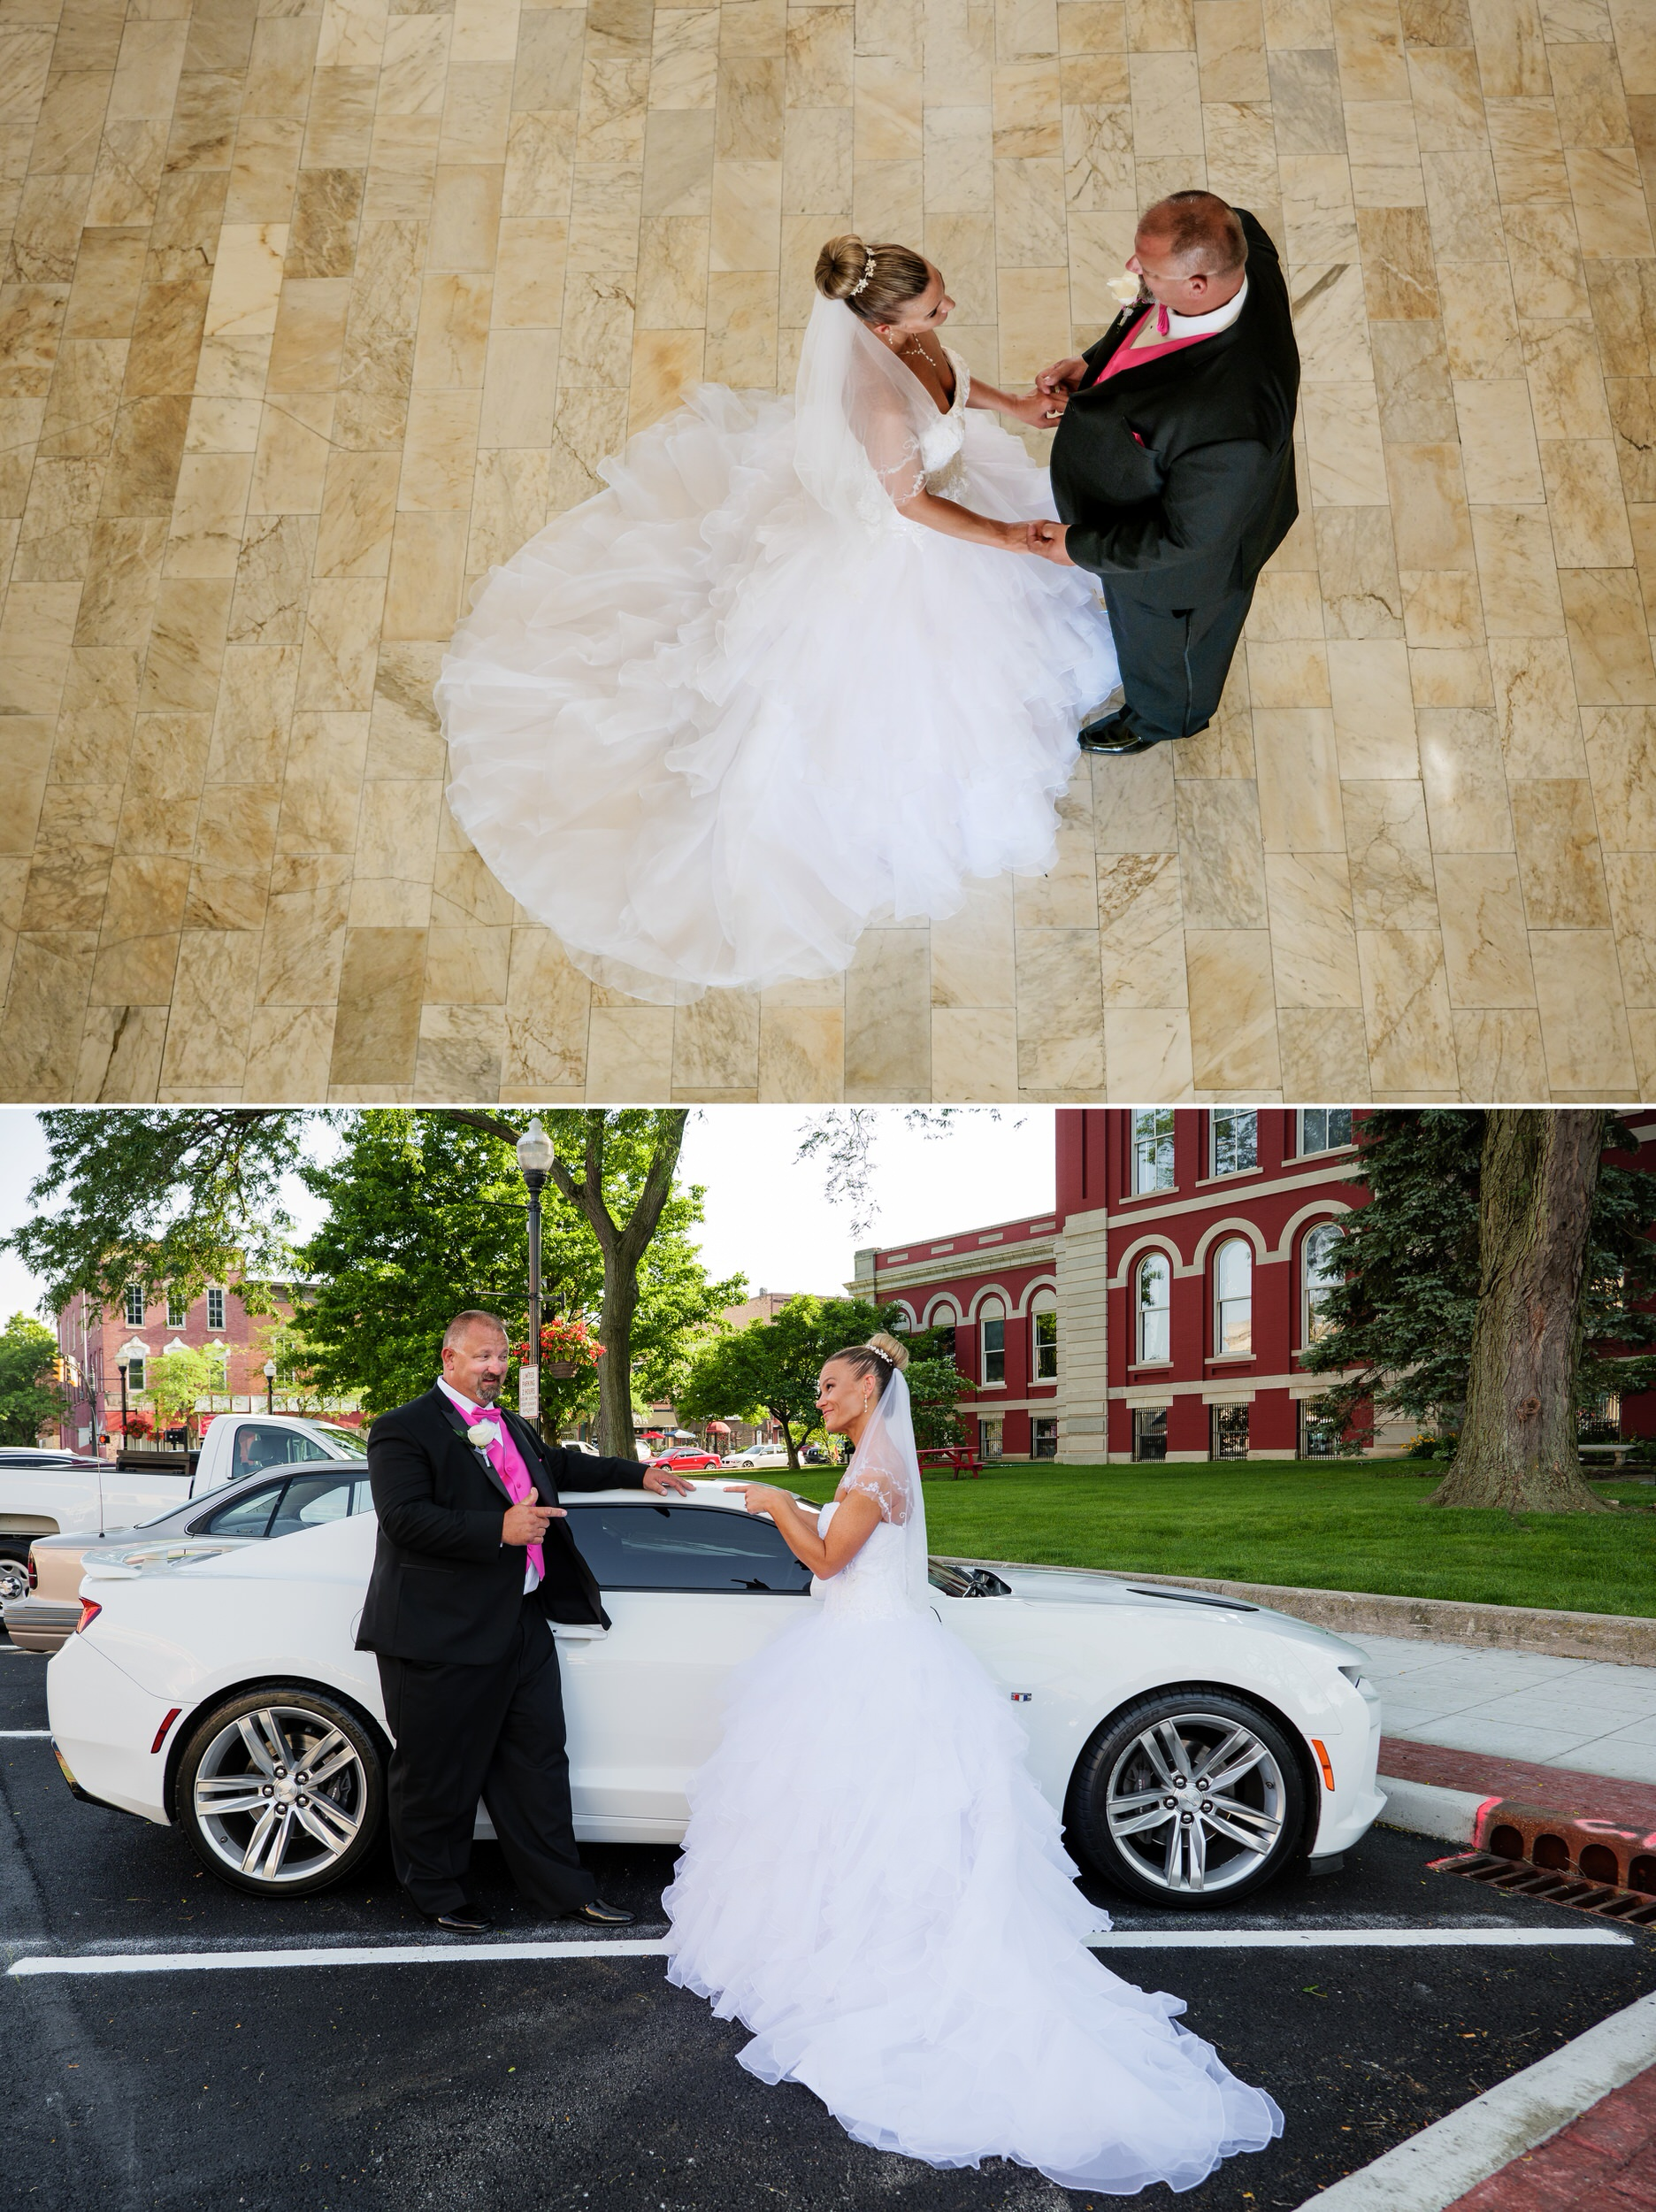 wedding-portraits-downtown-square 1.jpg